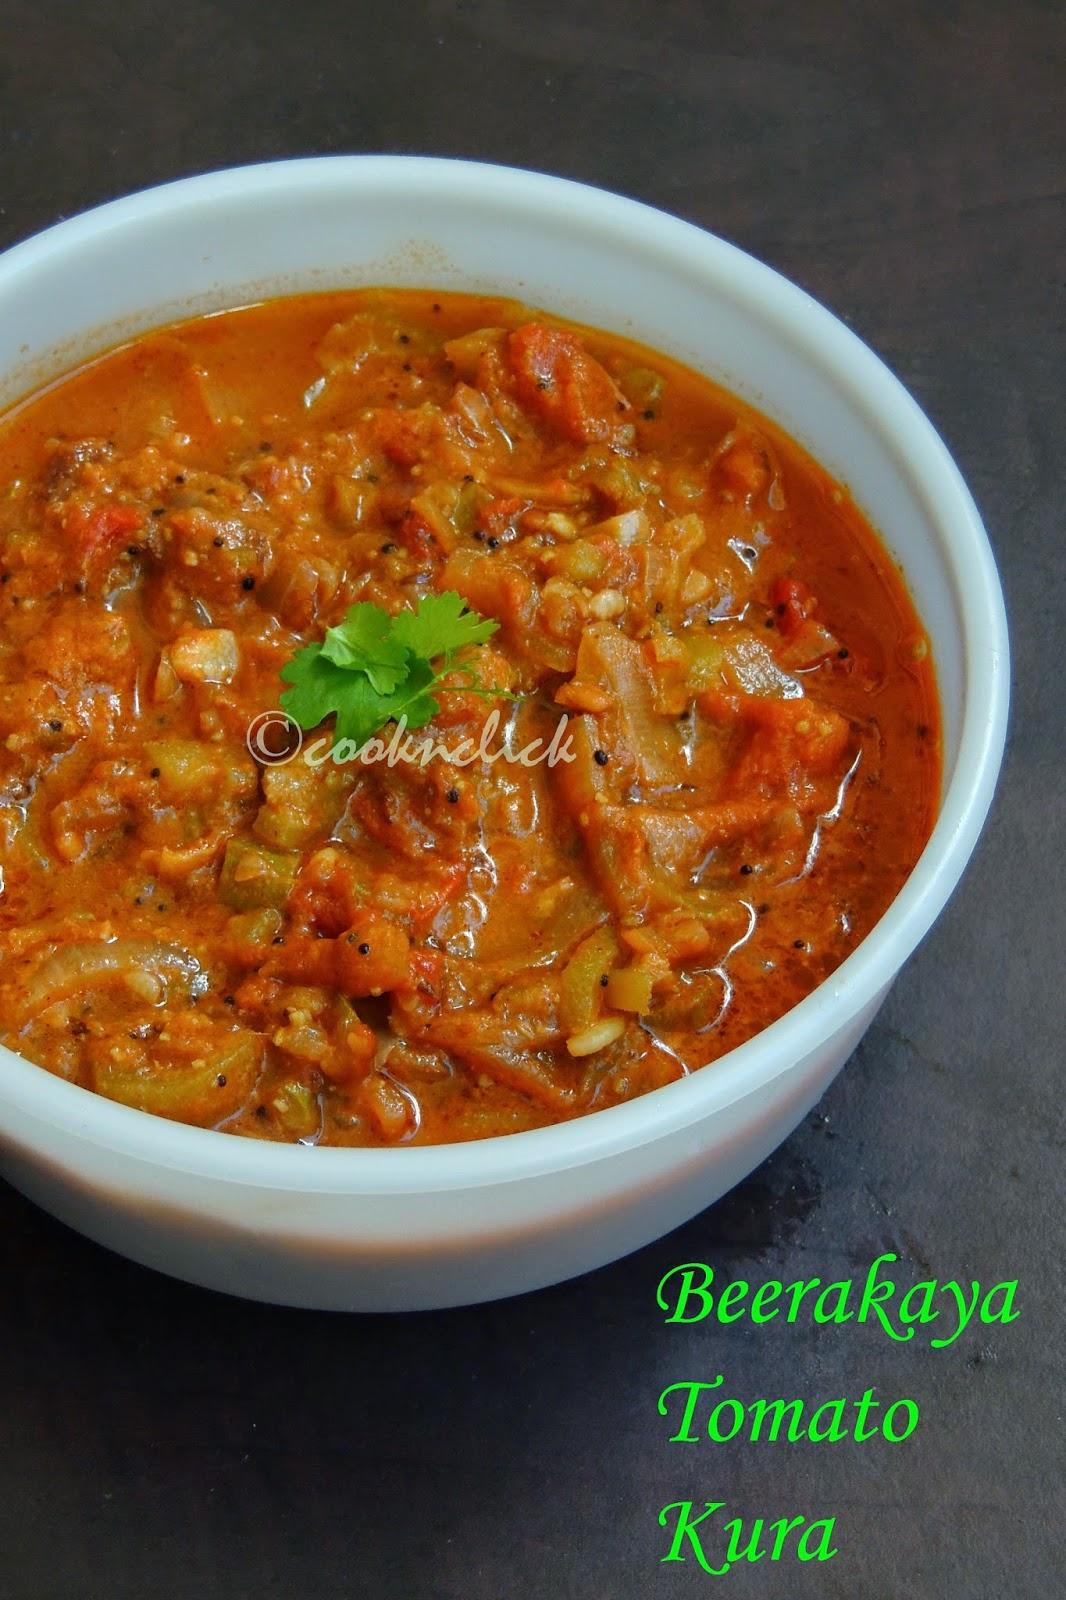 Ridgegourd tomato curry, beerakaya tomato kura,Vegan tomato ridgegourd curry